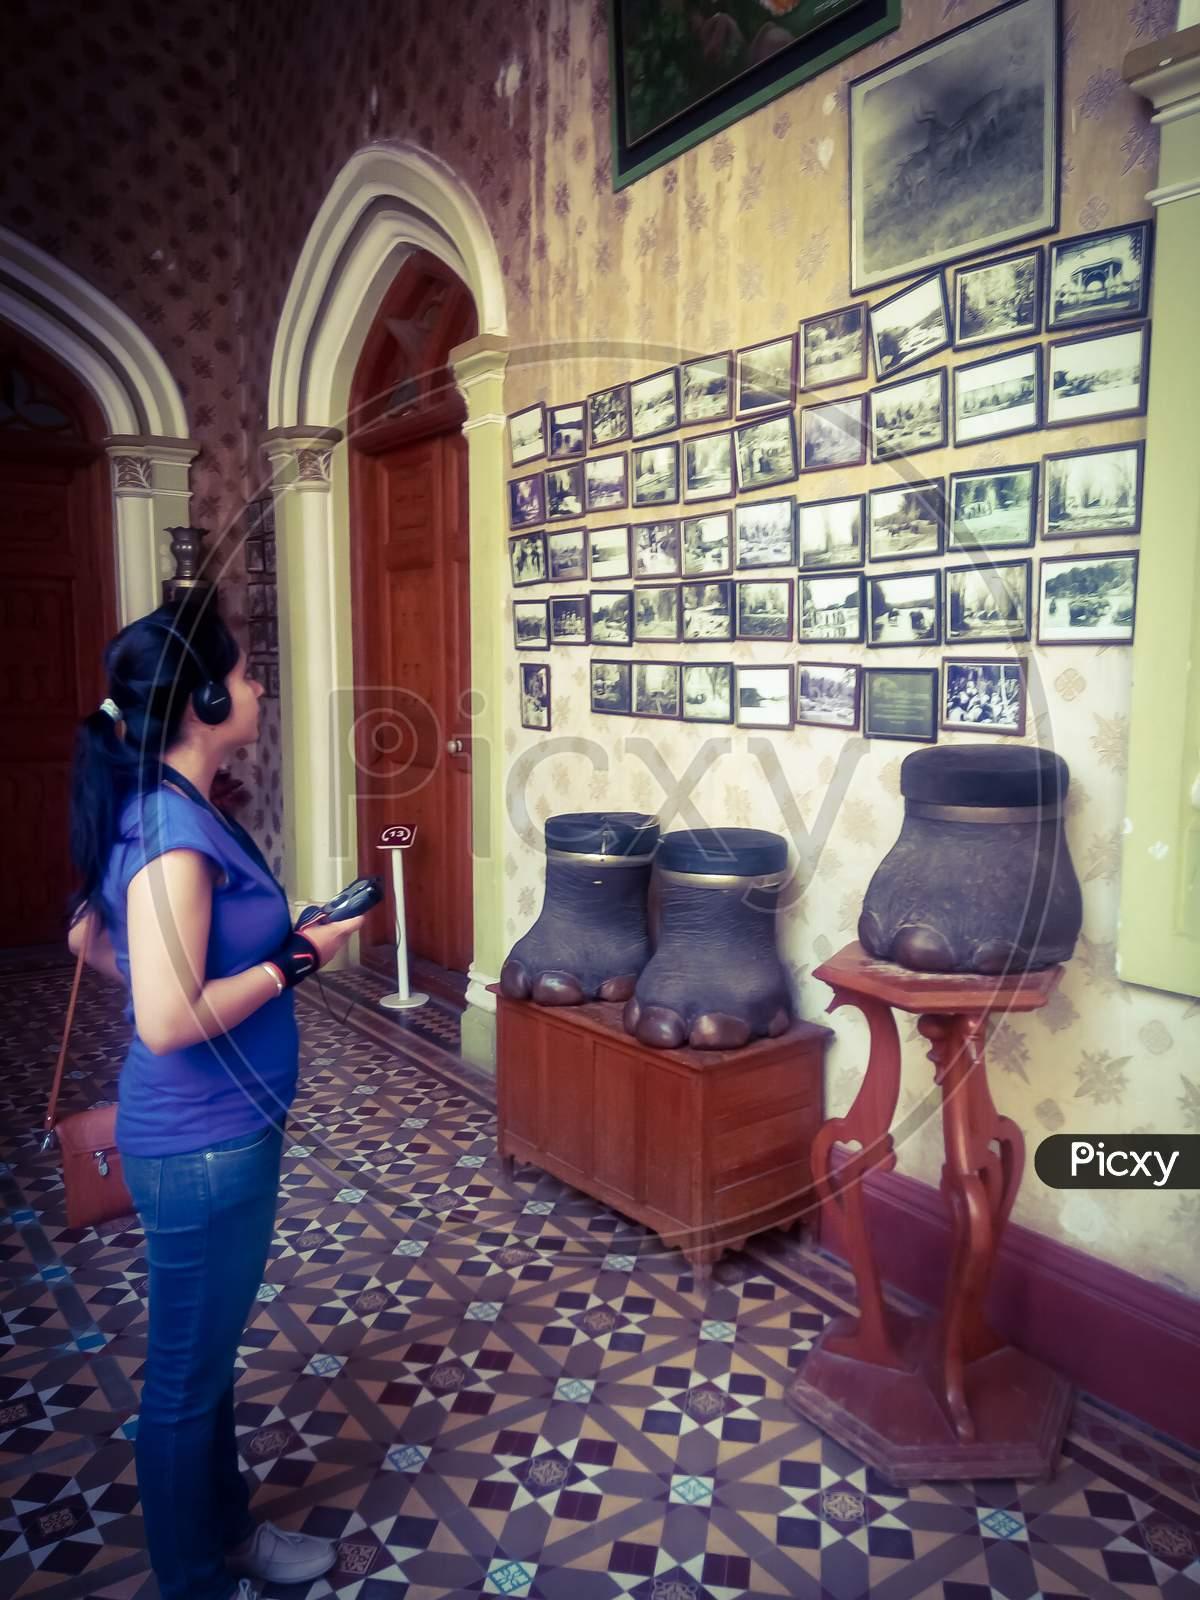 Tourist Observing The Photos Hung On The Wall In Bangalore Palace, Jayamahal Palace In Bangalore Karnataka India.